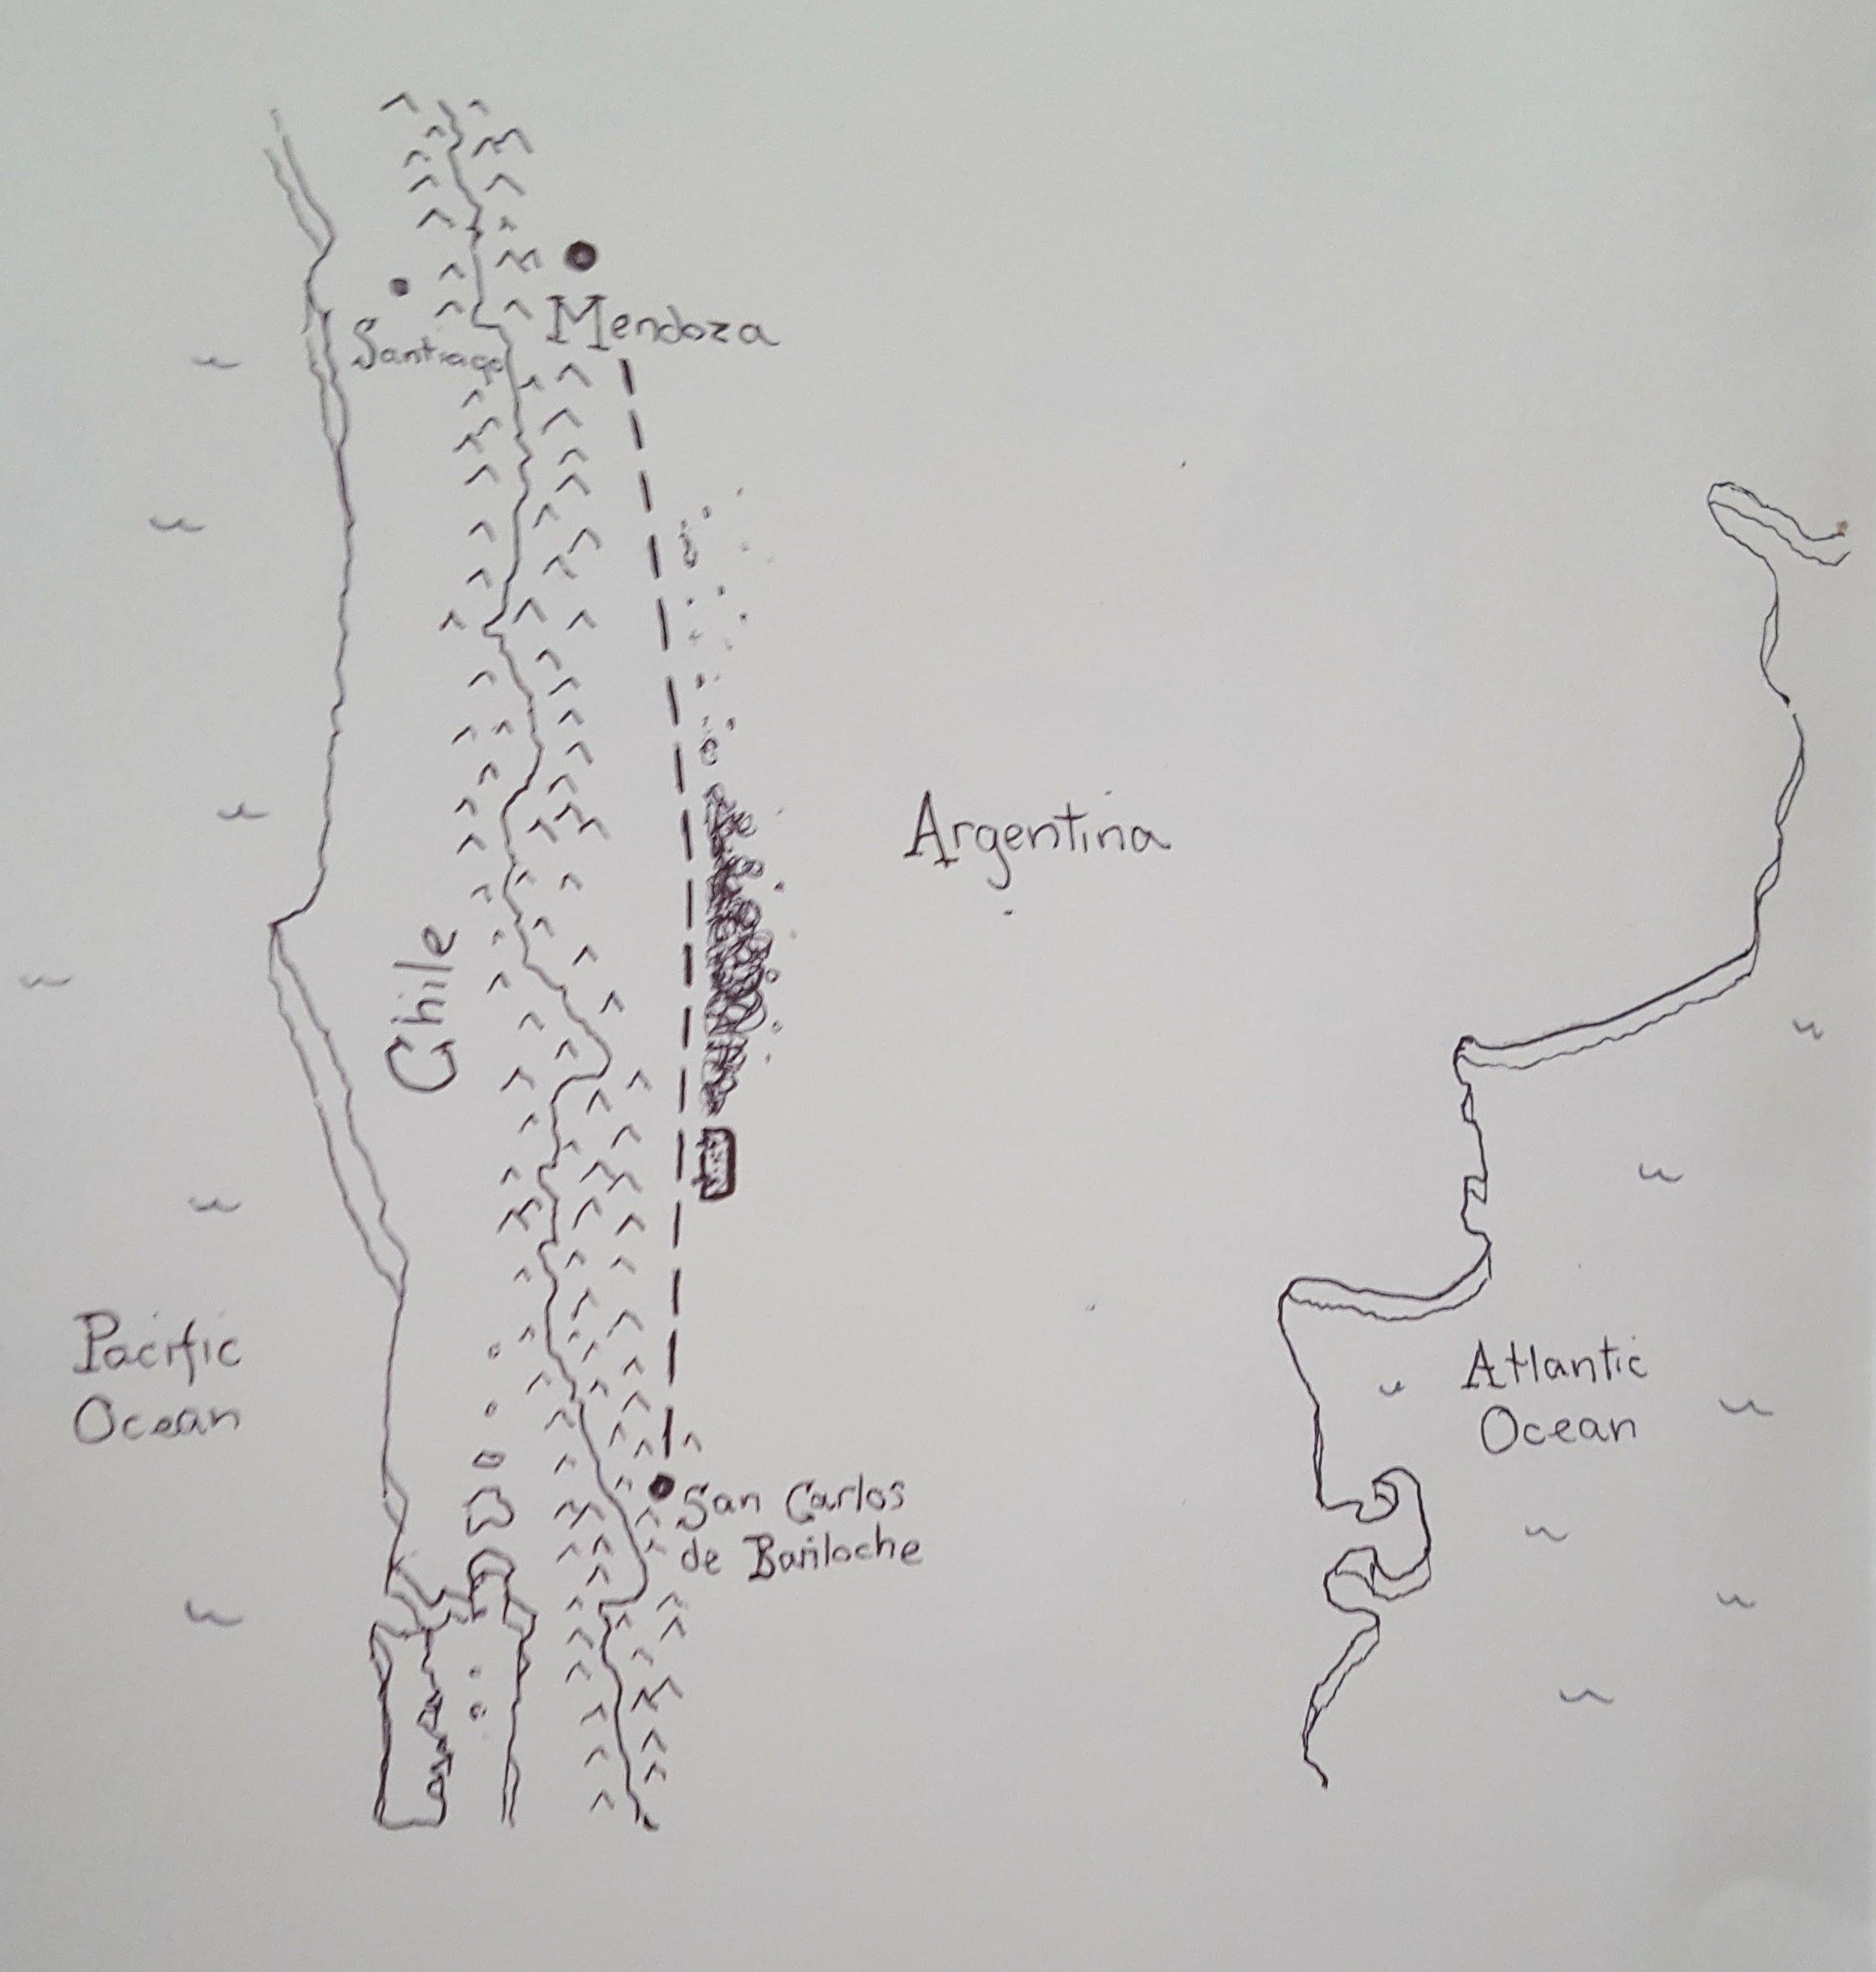 IBB_Travel_SA_Map_bariloche